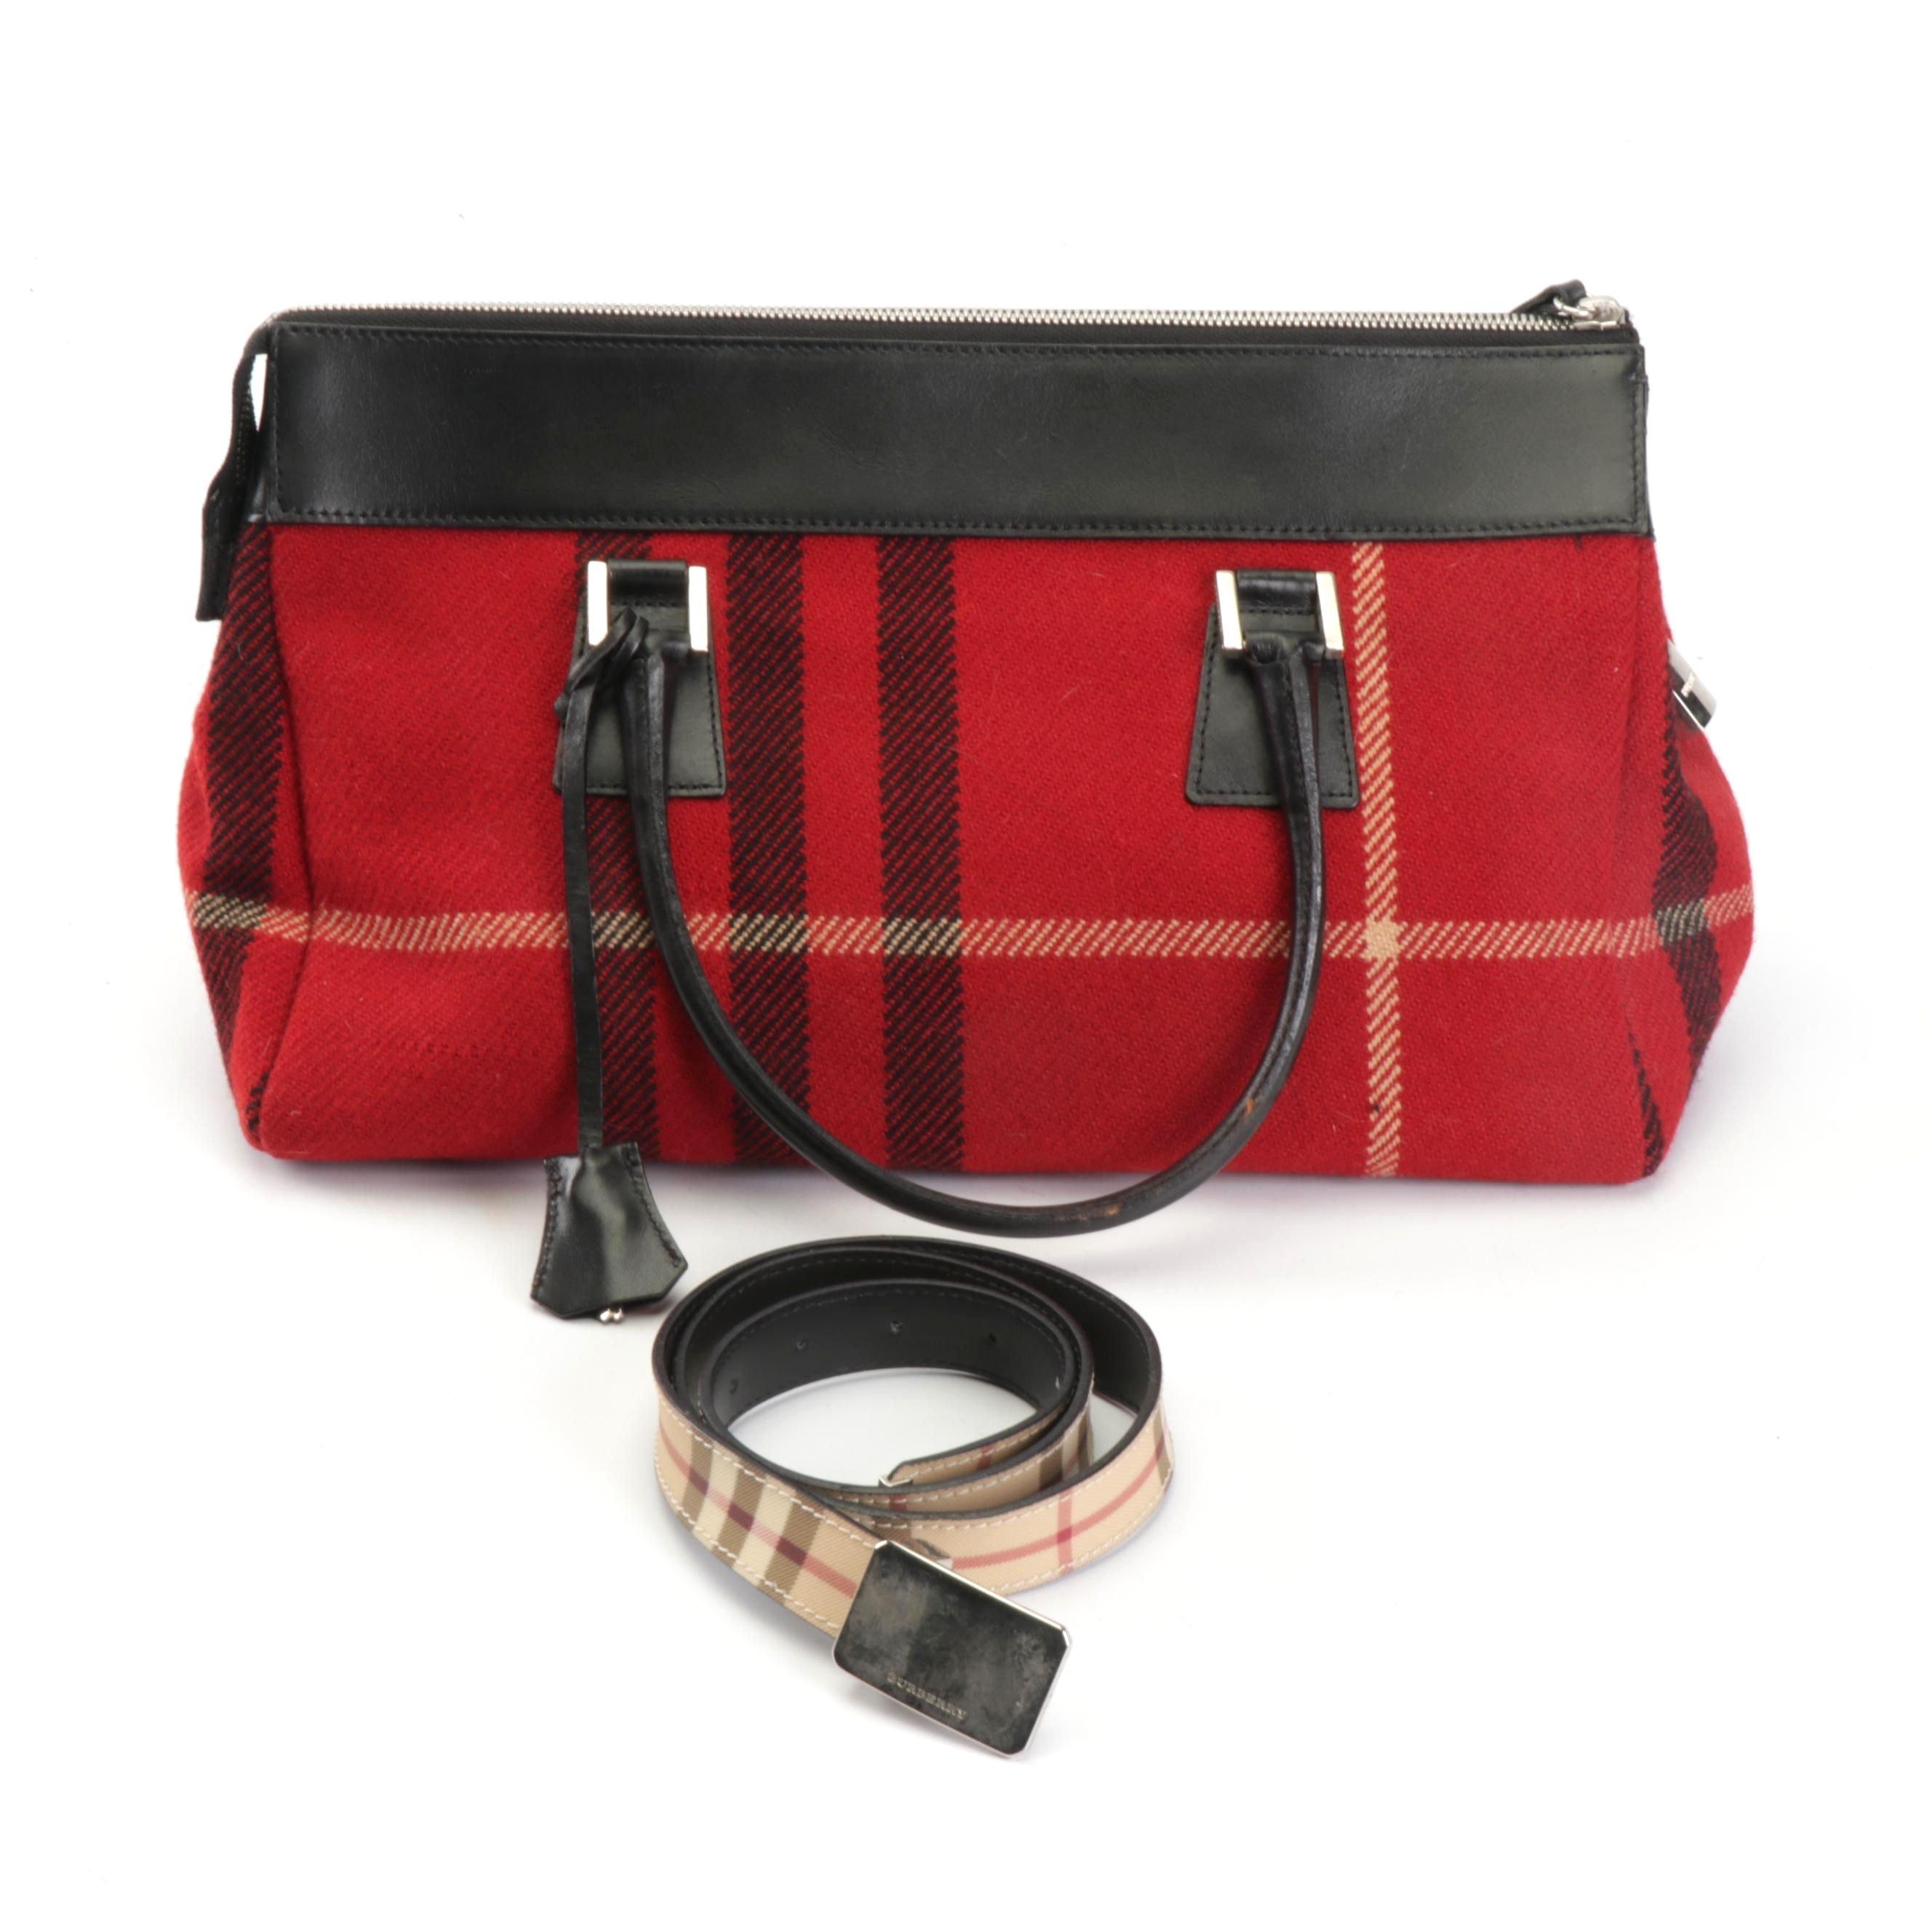 Burberry London Plaid Wool and Leather Handbag and Plaid Leather Belt